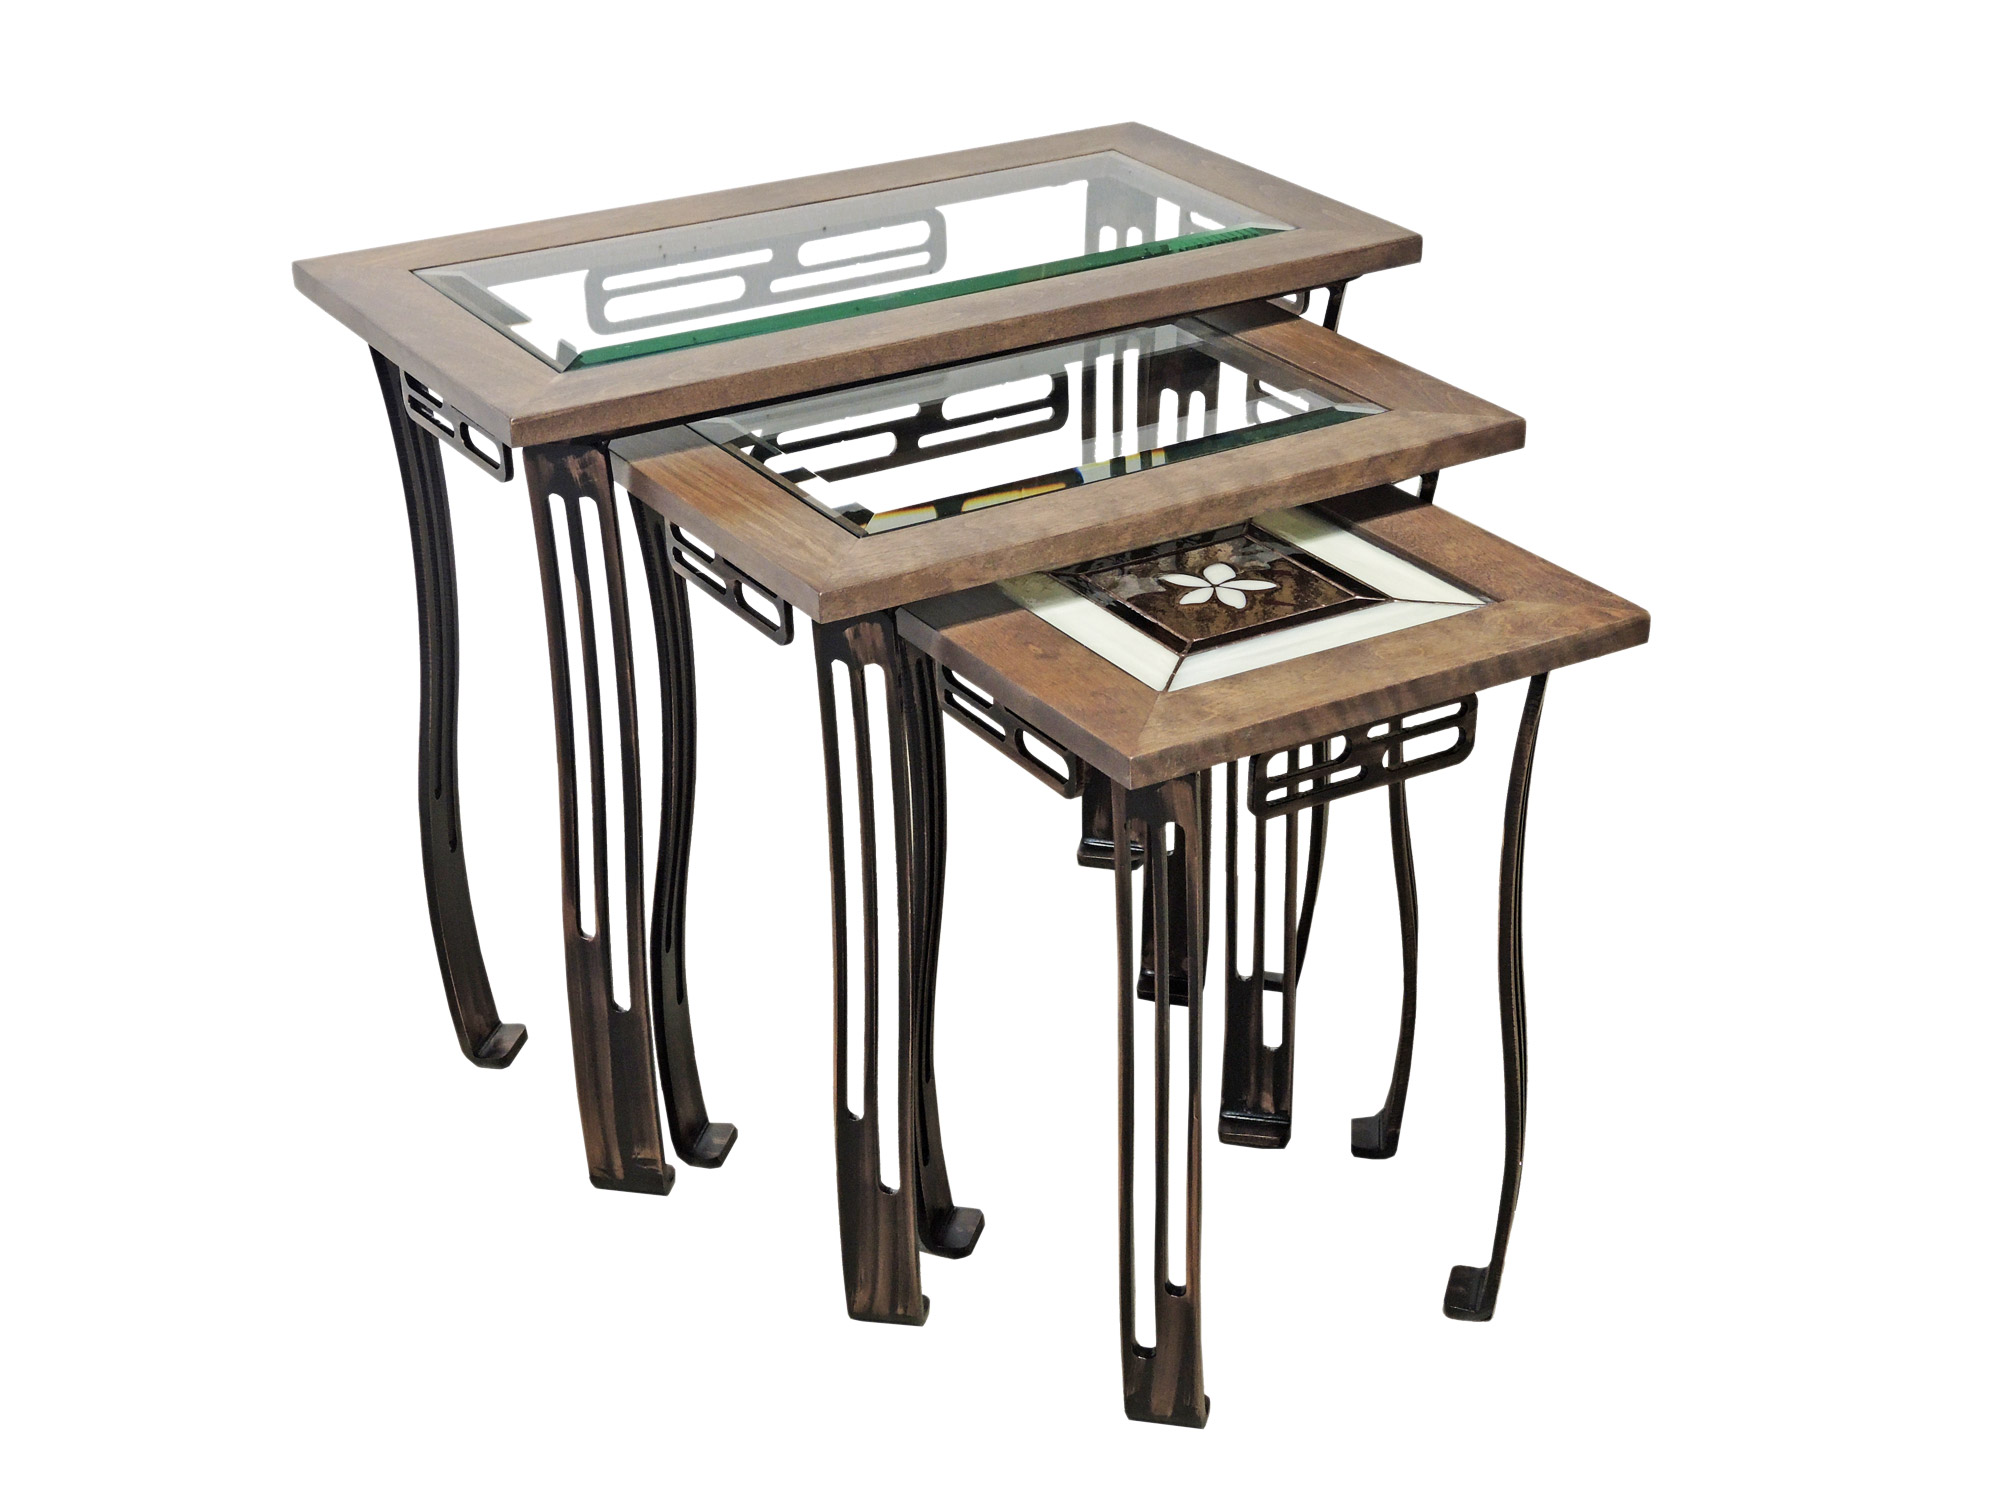 TABLES GIGOGNES VITRAIL